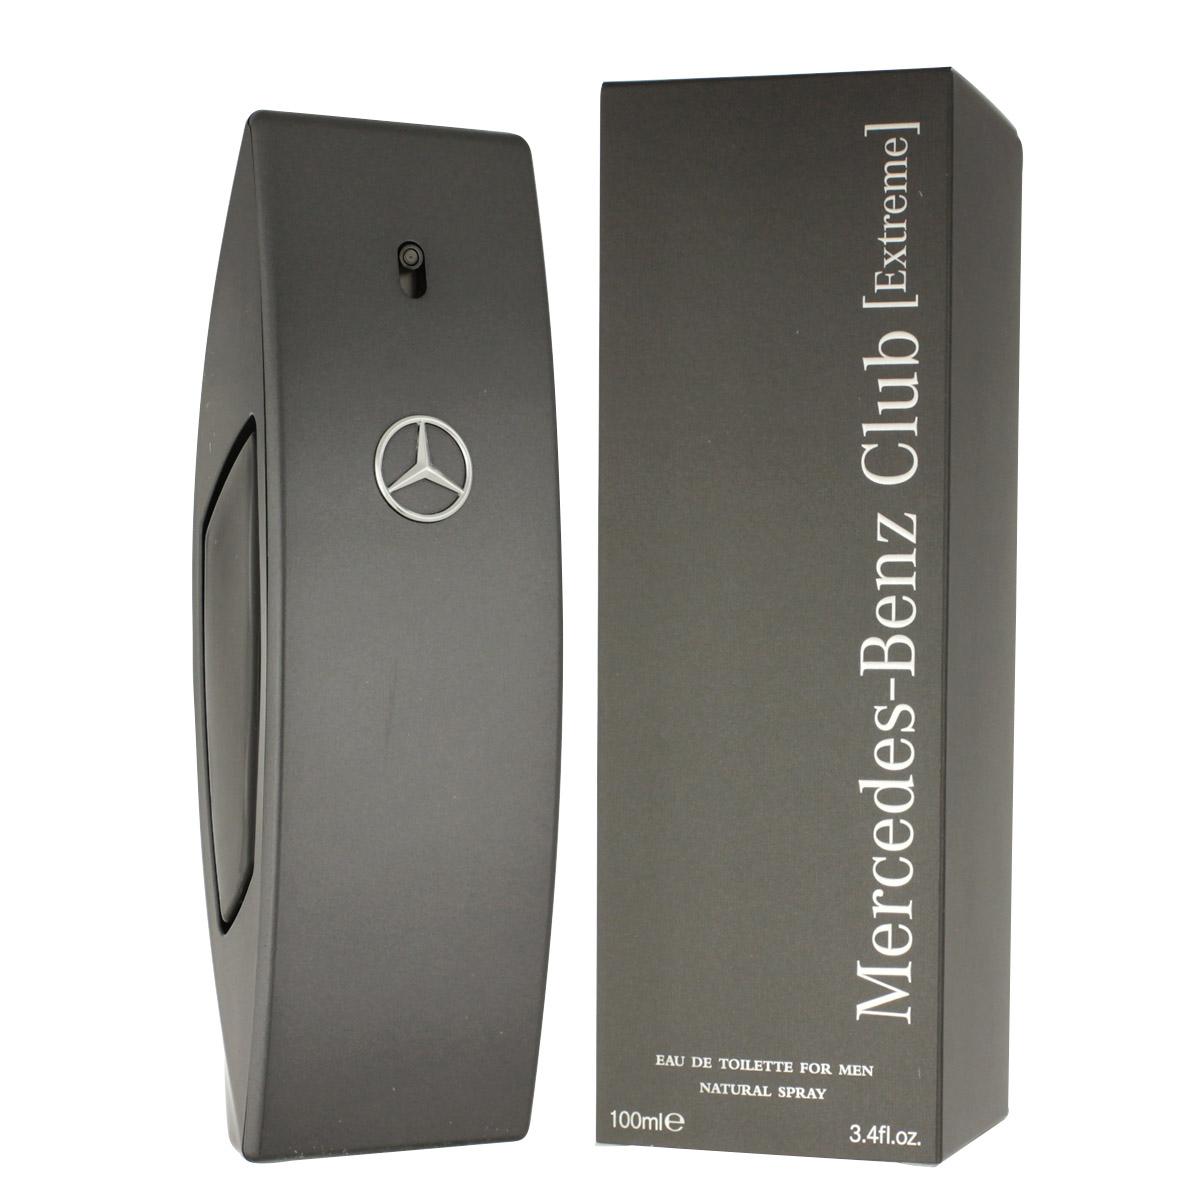 Mercedes-Benz Mercedes-Benz Club Extreme EDT 100 ml M